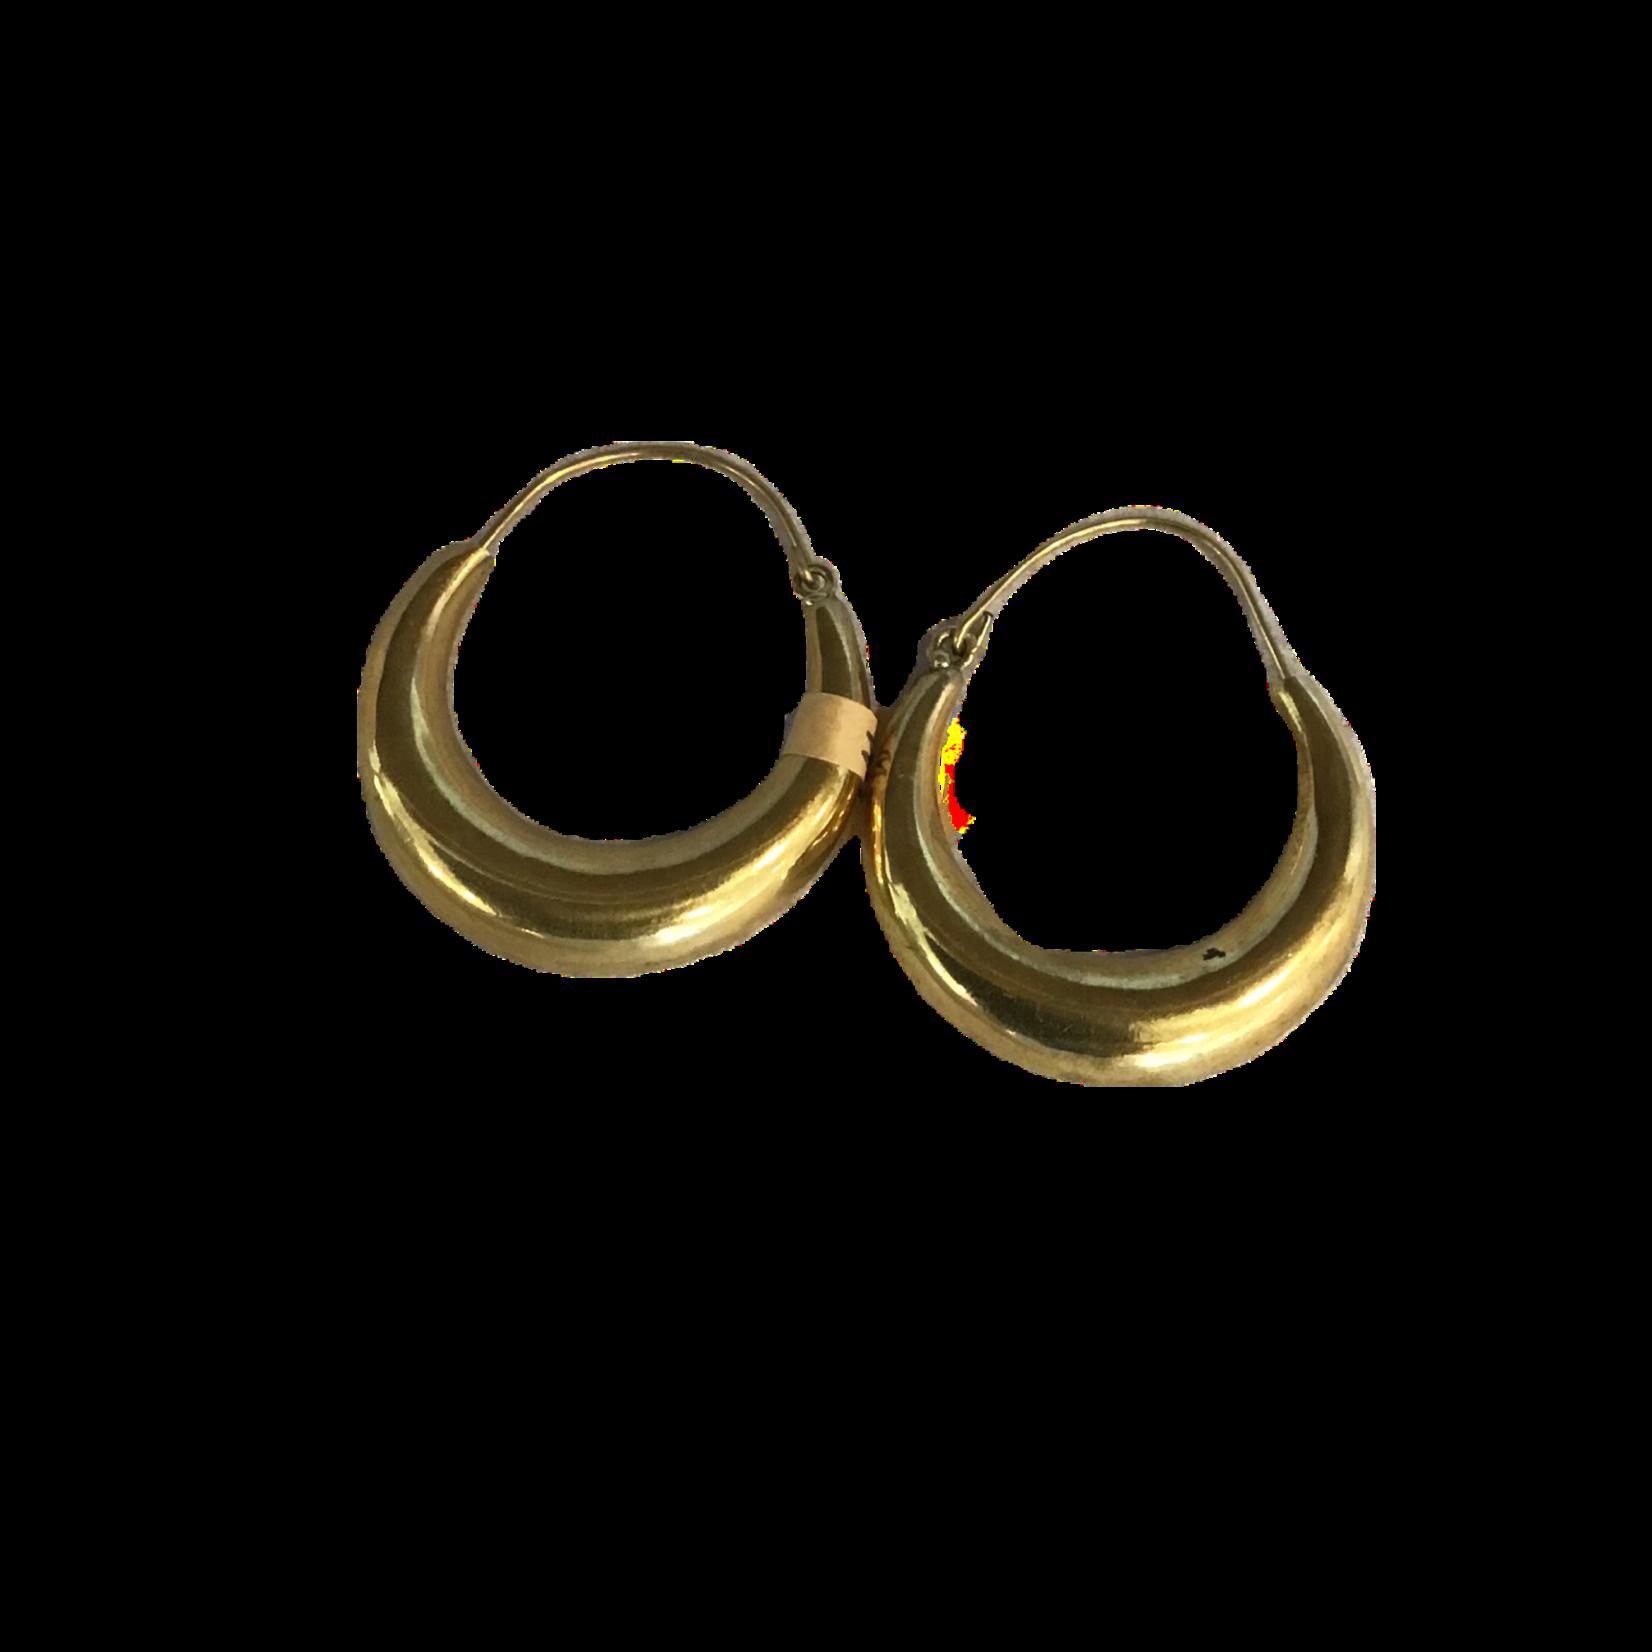 Wildsea Handmade Brass Hoops